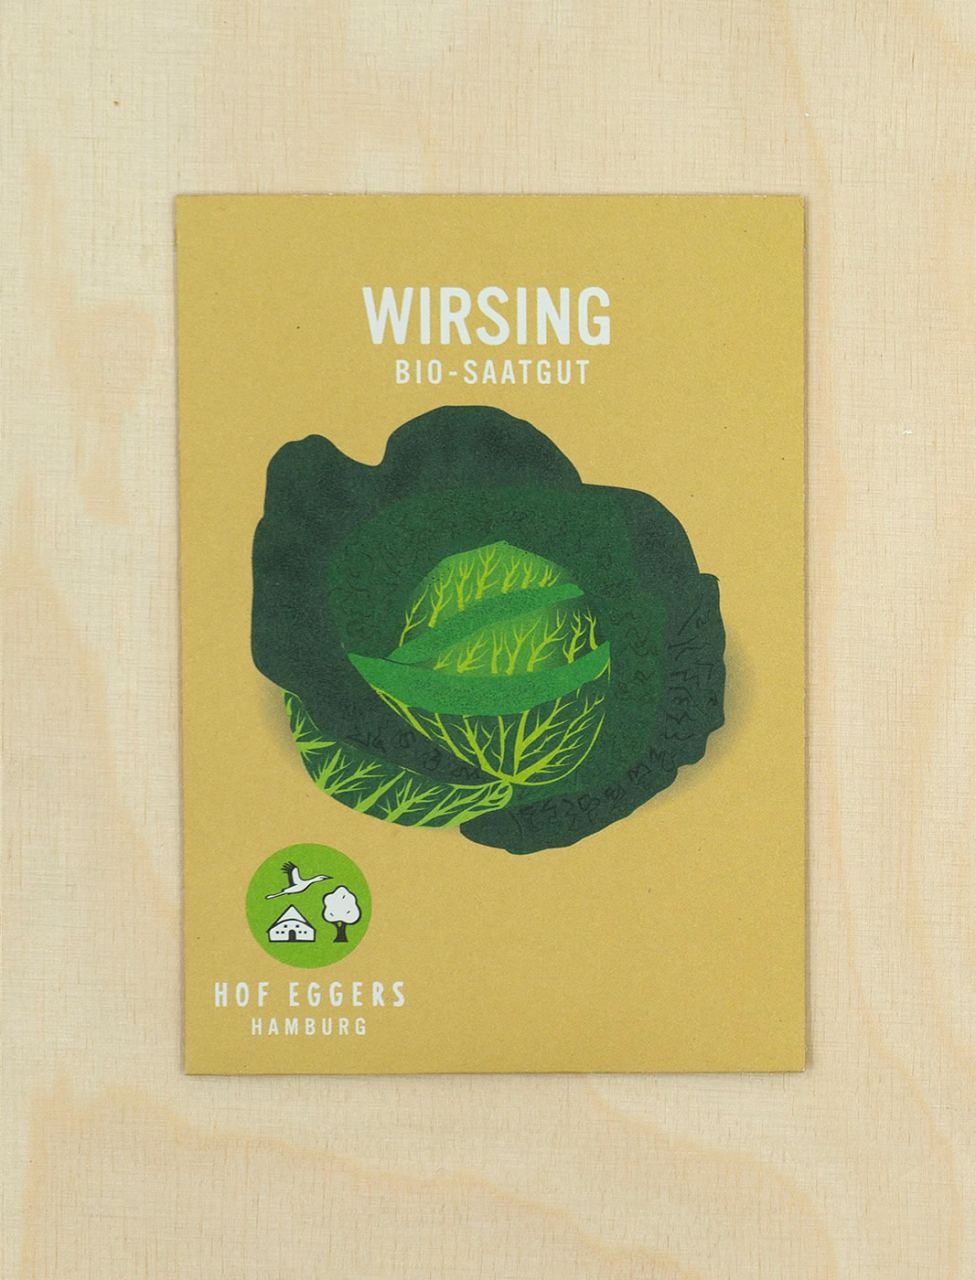 "Wirsing ""a pied court de plainpalais"", Bio-Saatgut"